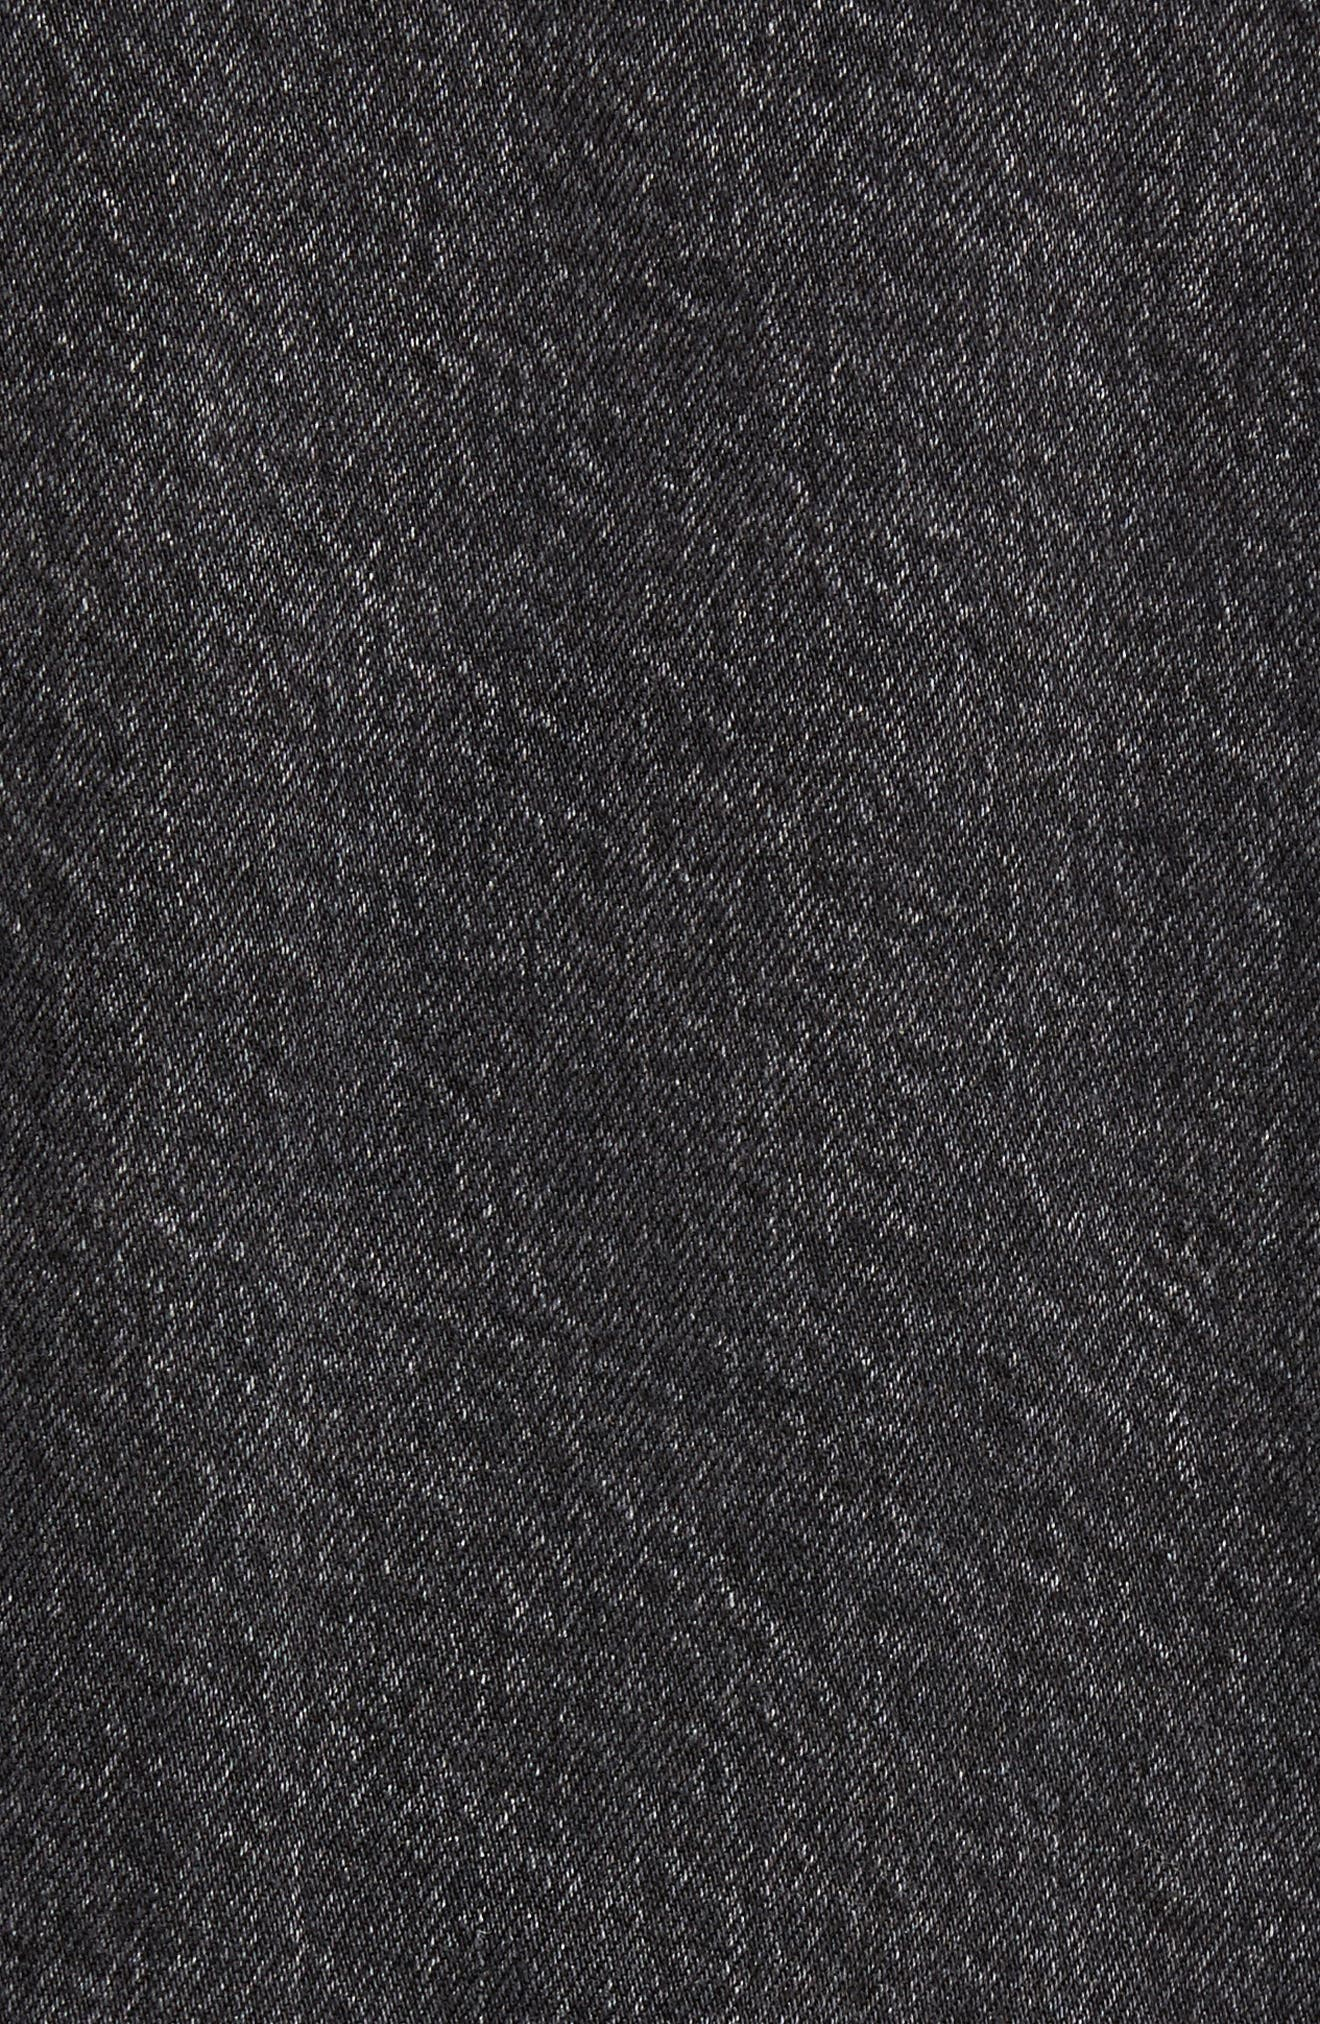 Altered Distressed Denim Trucker Jacket,                             Alternate thumbnail 6, color,                             001